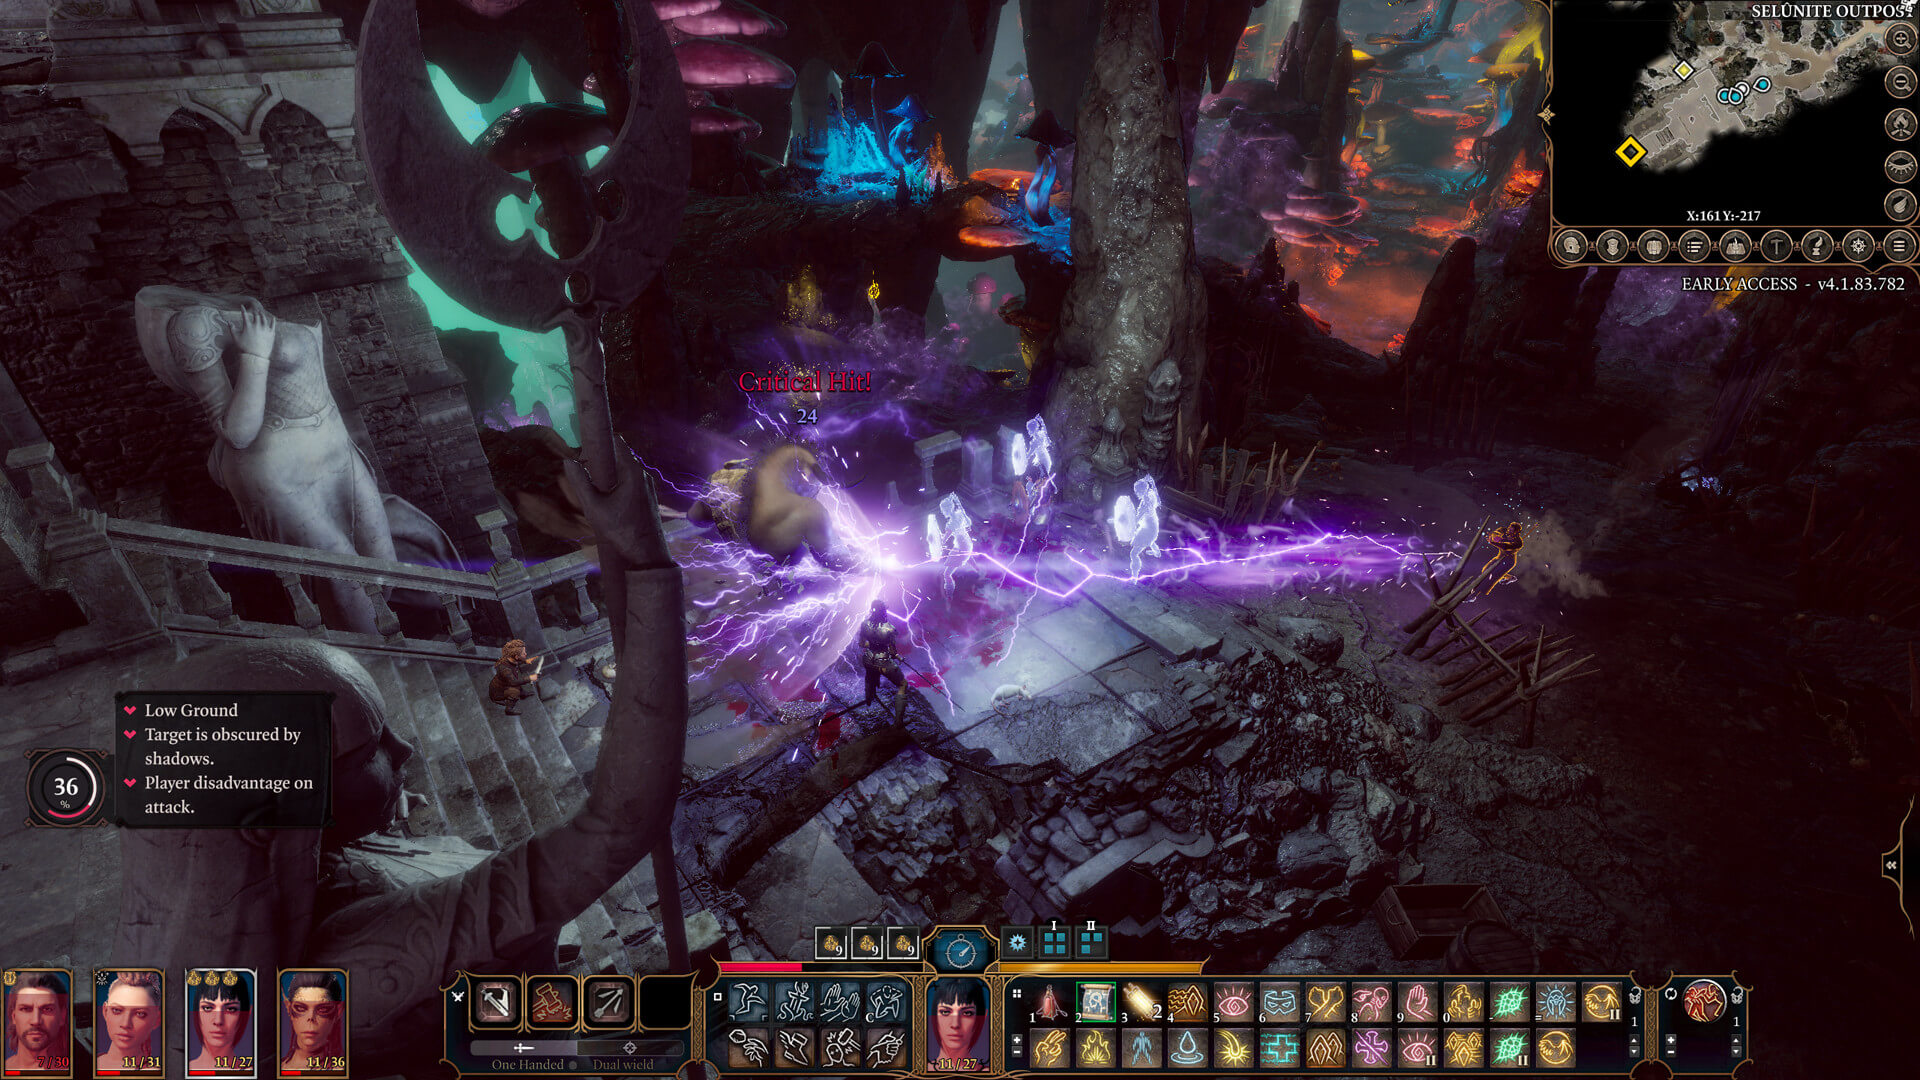 baldur's gate 3 oyun steam